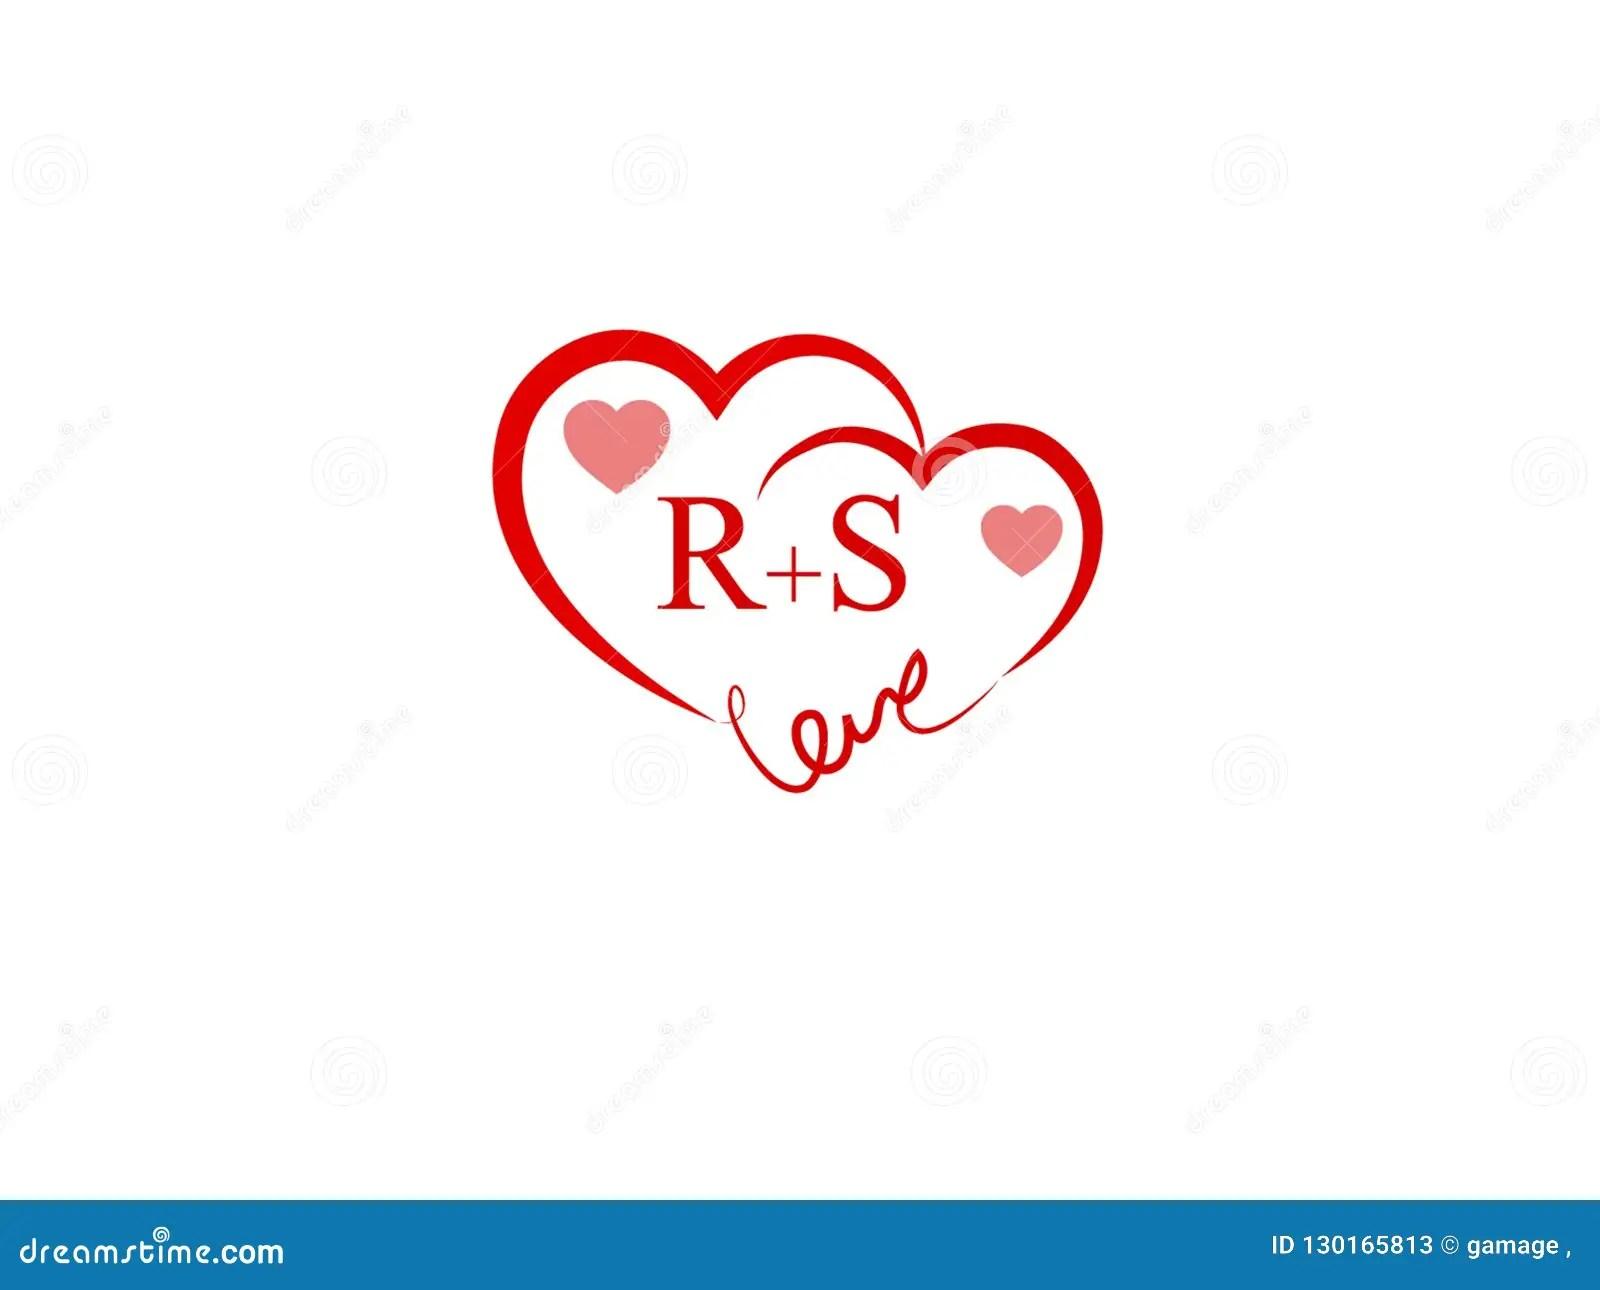 rs initial heart shape